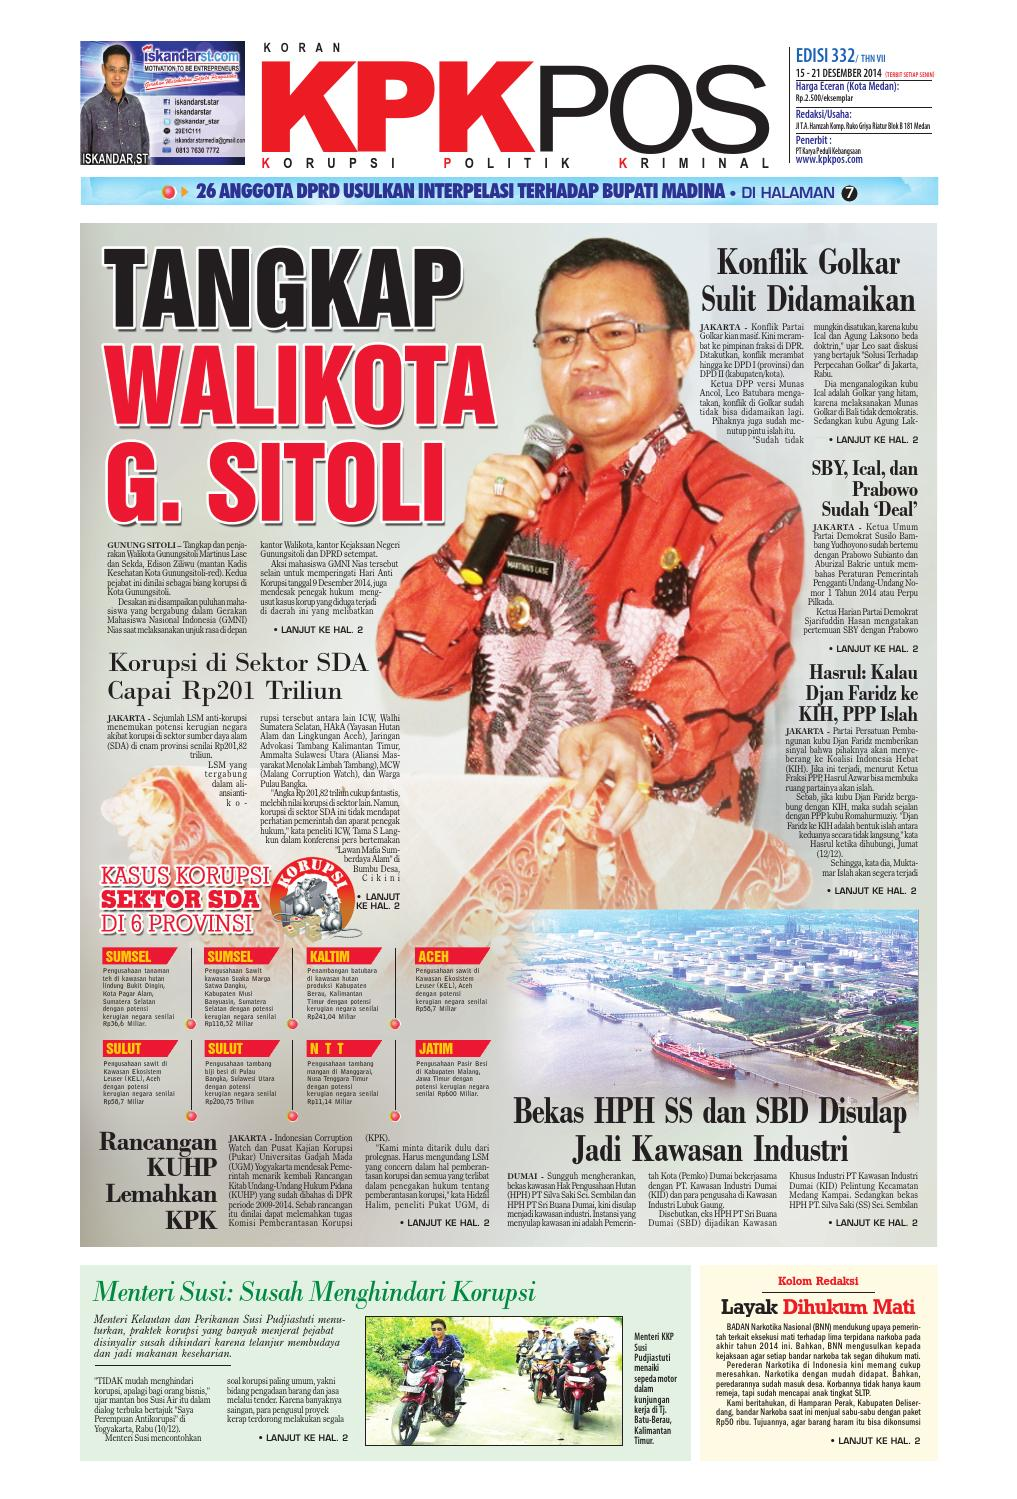 Epaper Kpkpos 332 Edisi Senin 15 Desember 2014 By Media Andalas Issuu